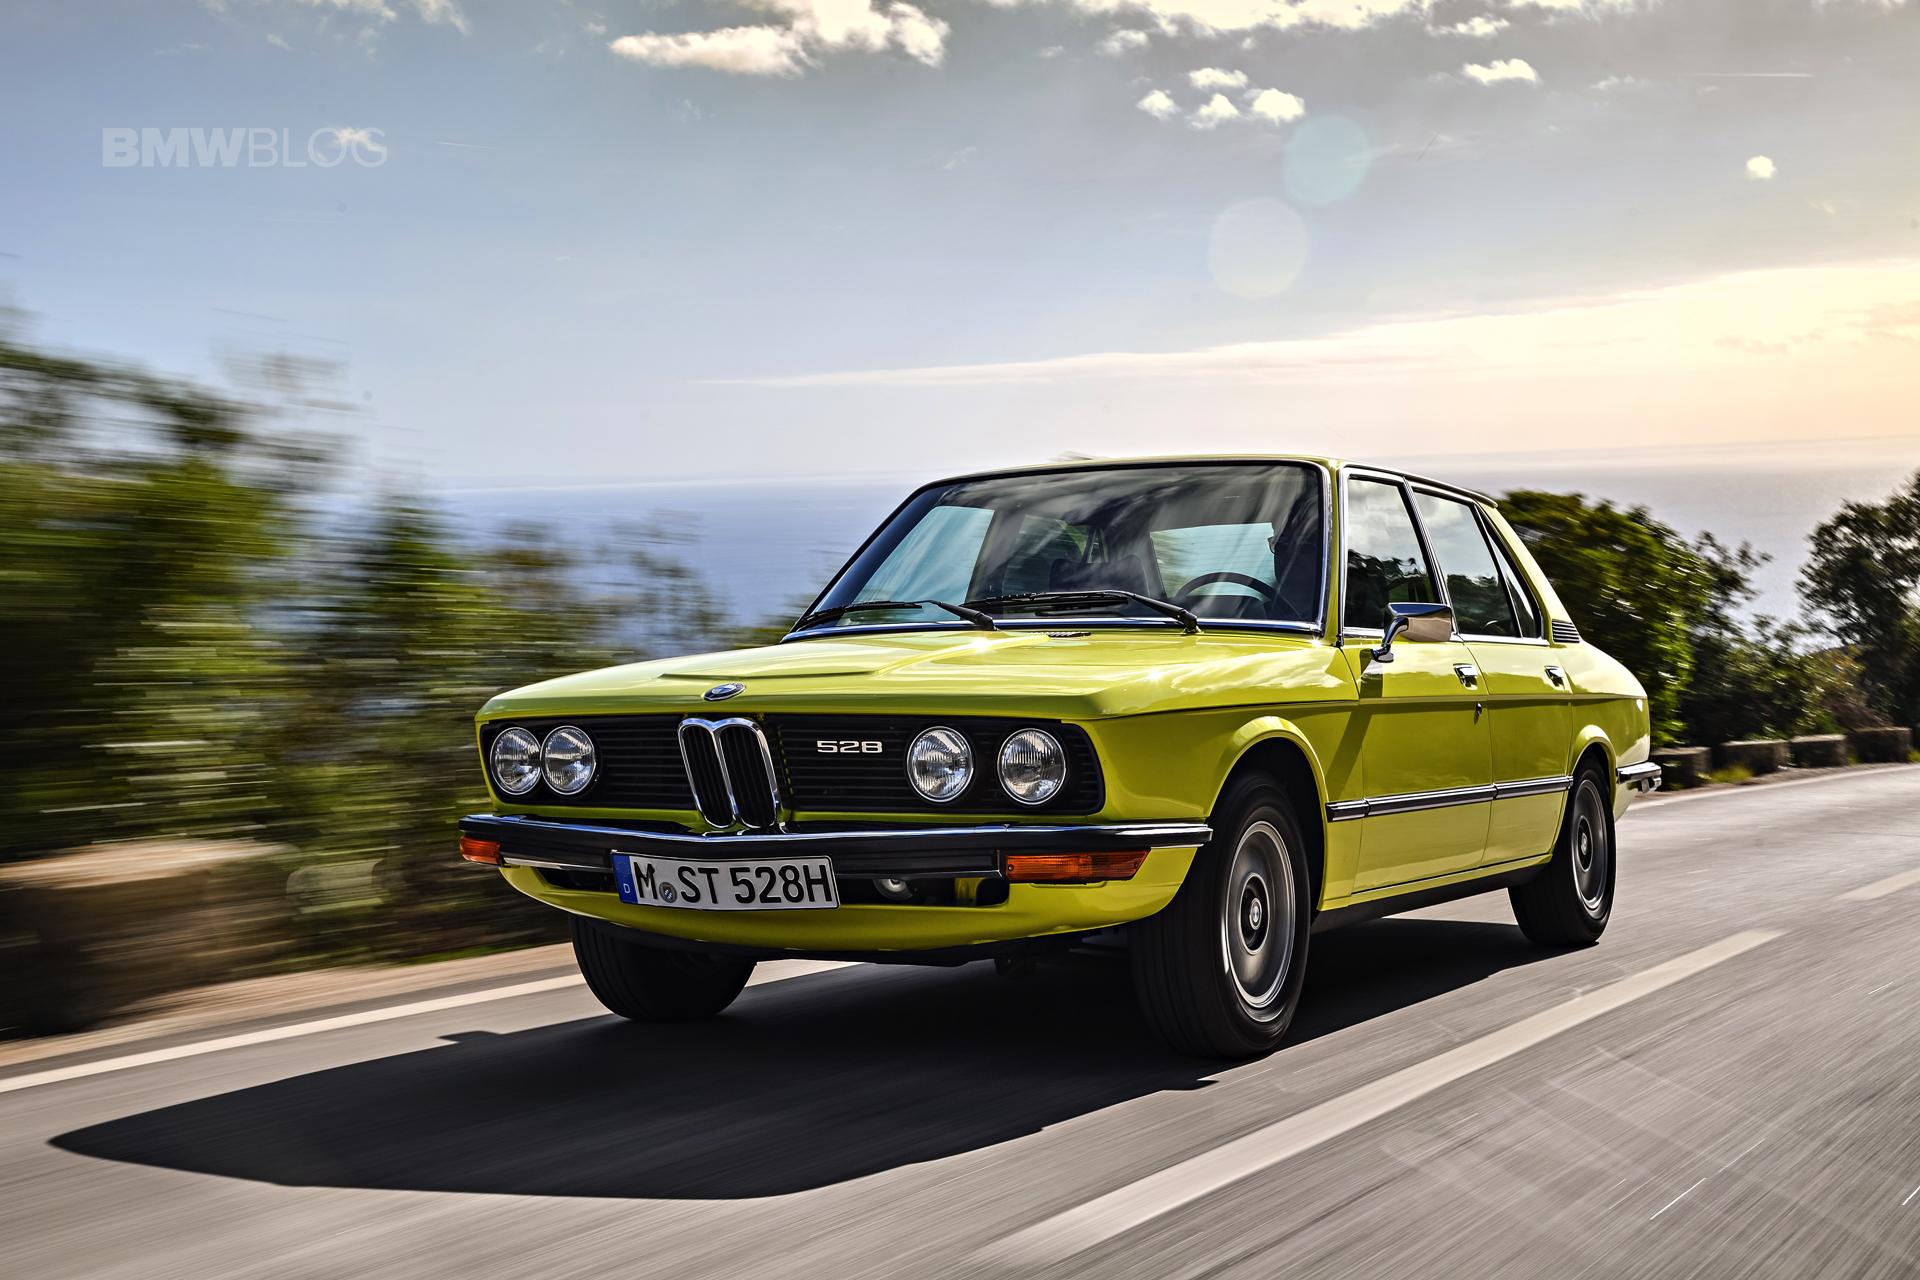 VIDEO: POV Drive Video of E12 BMW 5 Series